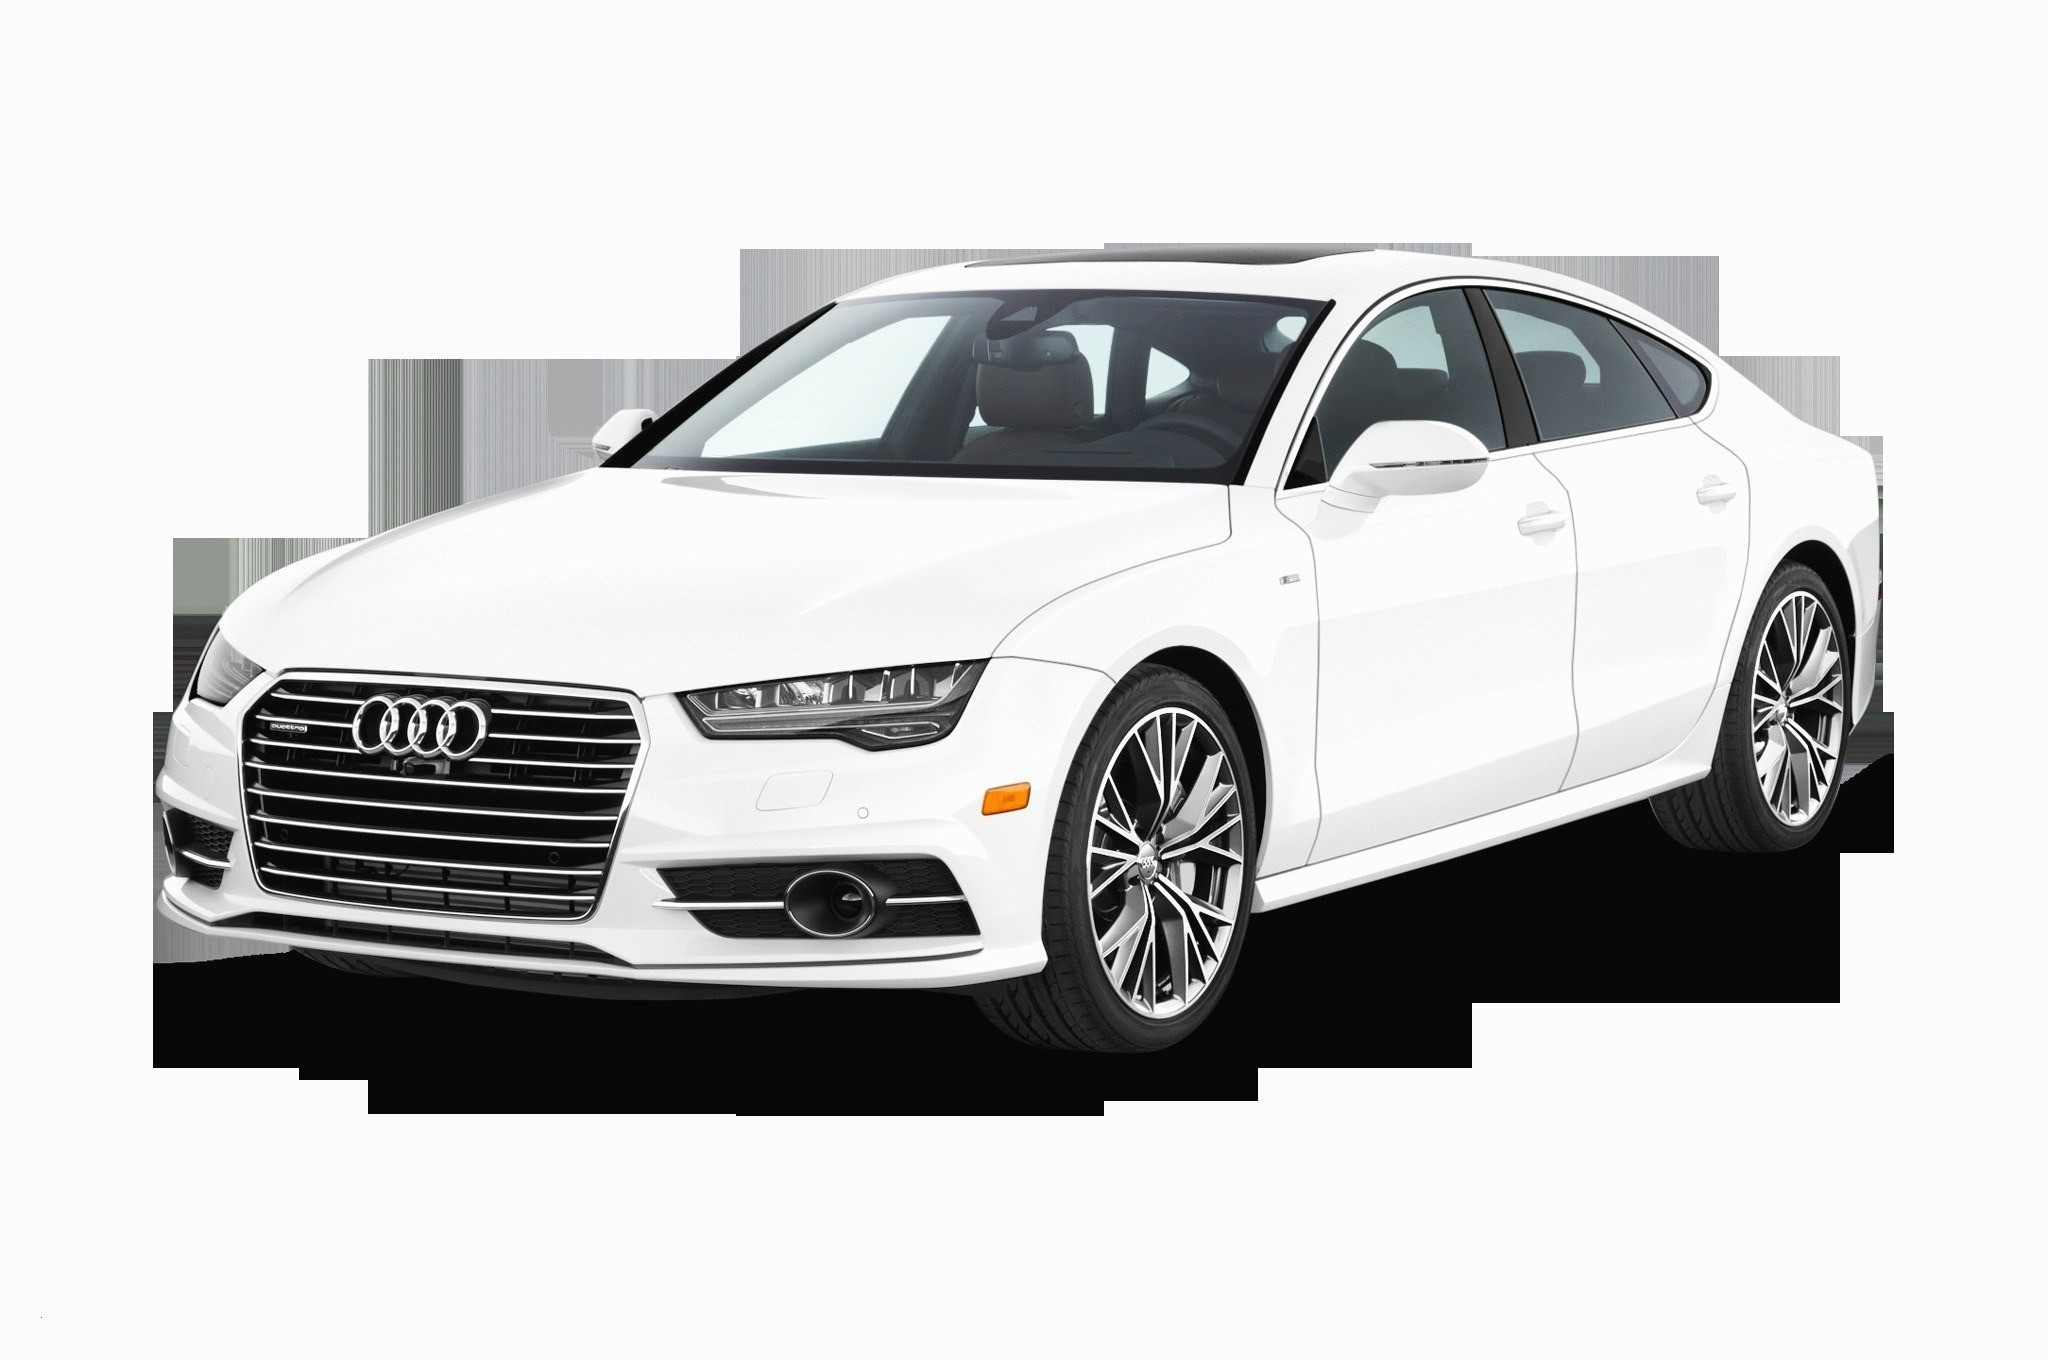 Sportwagen Zum Ausmalen Einzigartig 38 Audi Ausmalbilder Scoredatscore Inspirierend Ausmalbilder Stock